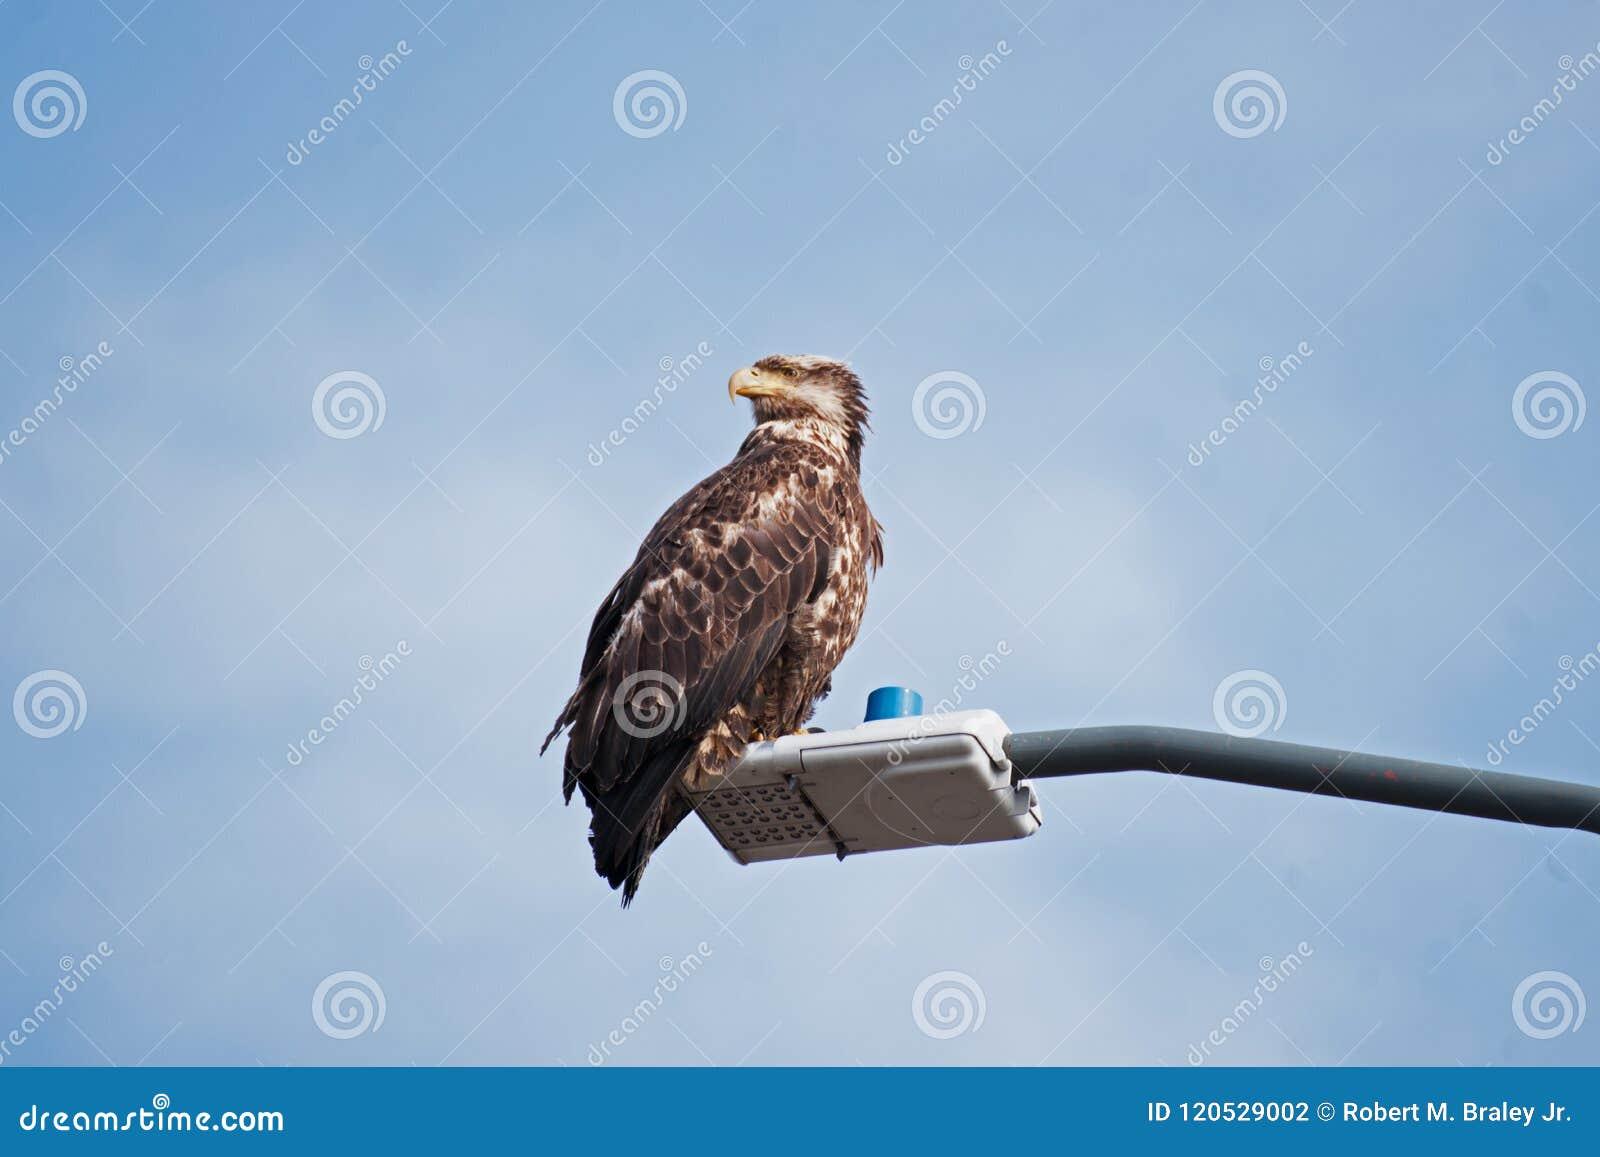 Young Bald Eagle Sand Point Alaska